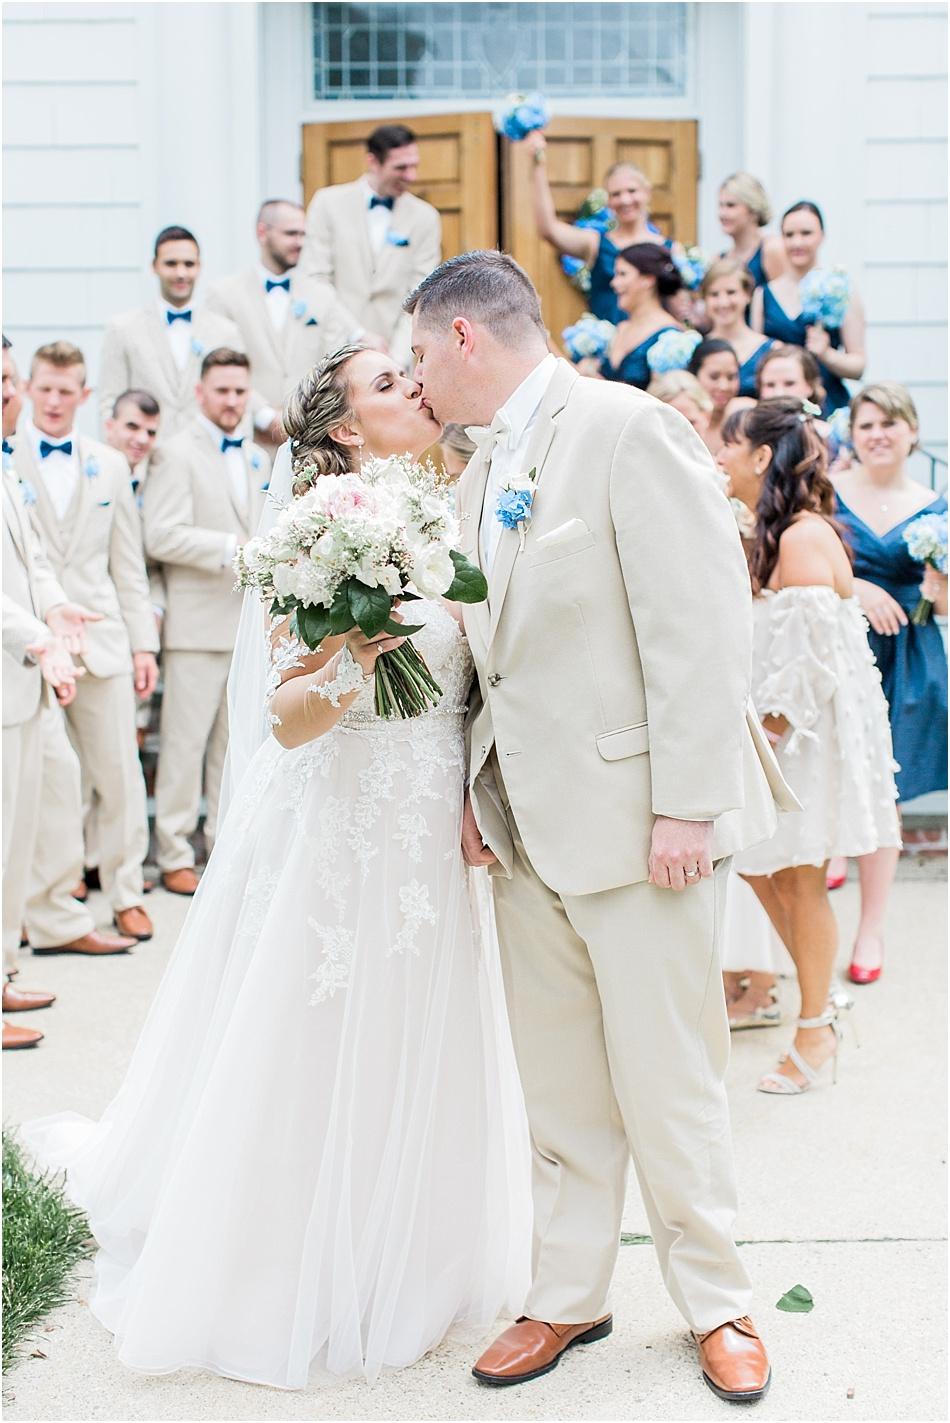 brookside_country_club_cape_cod_boston_wedding_photographer_Meredith_Jane_Photography_photo_0133.jpg